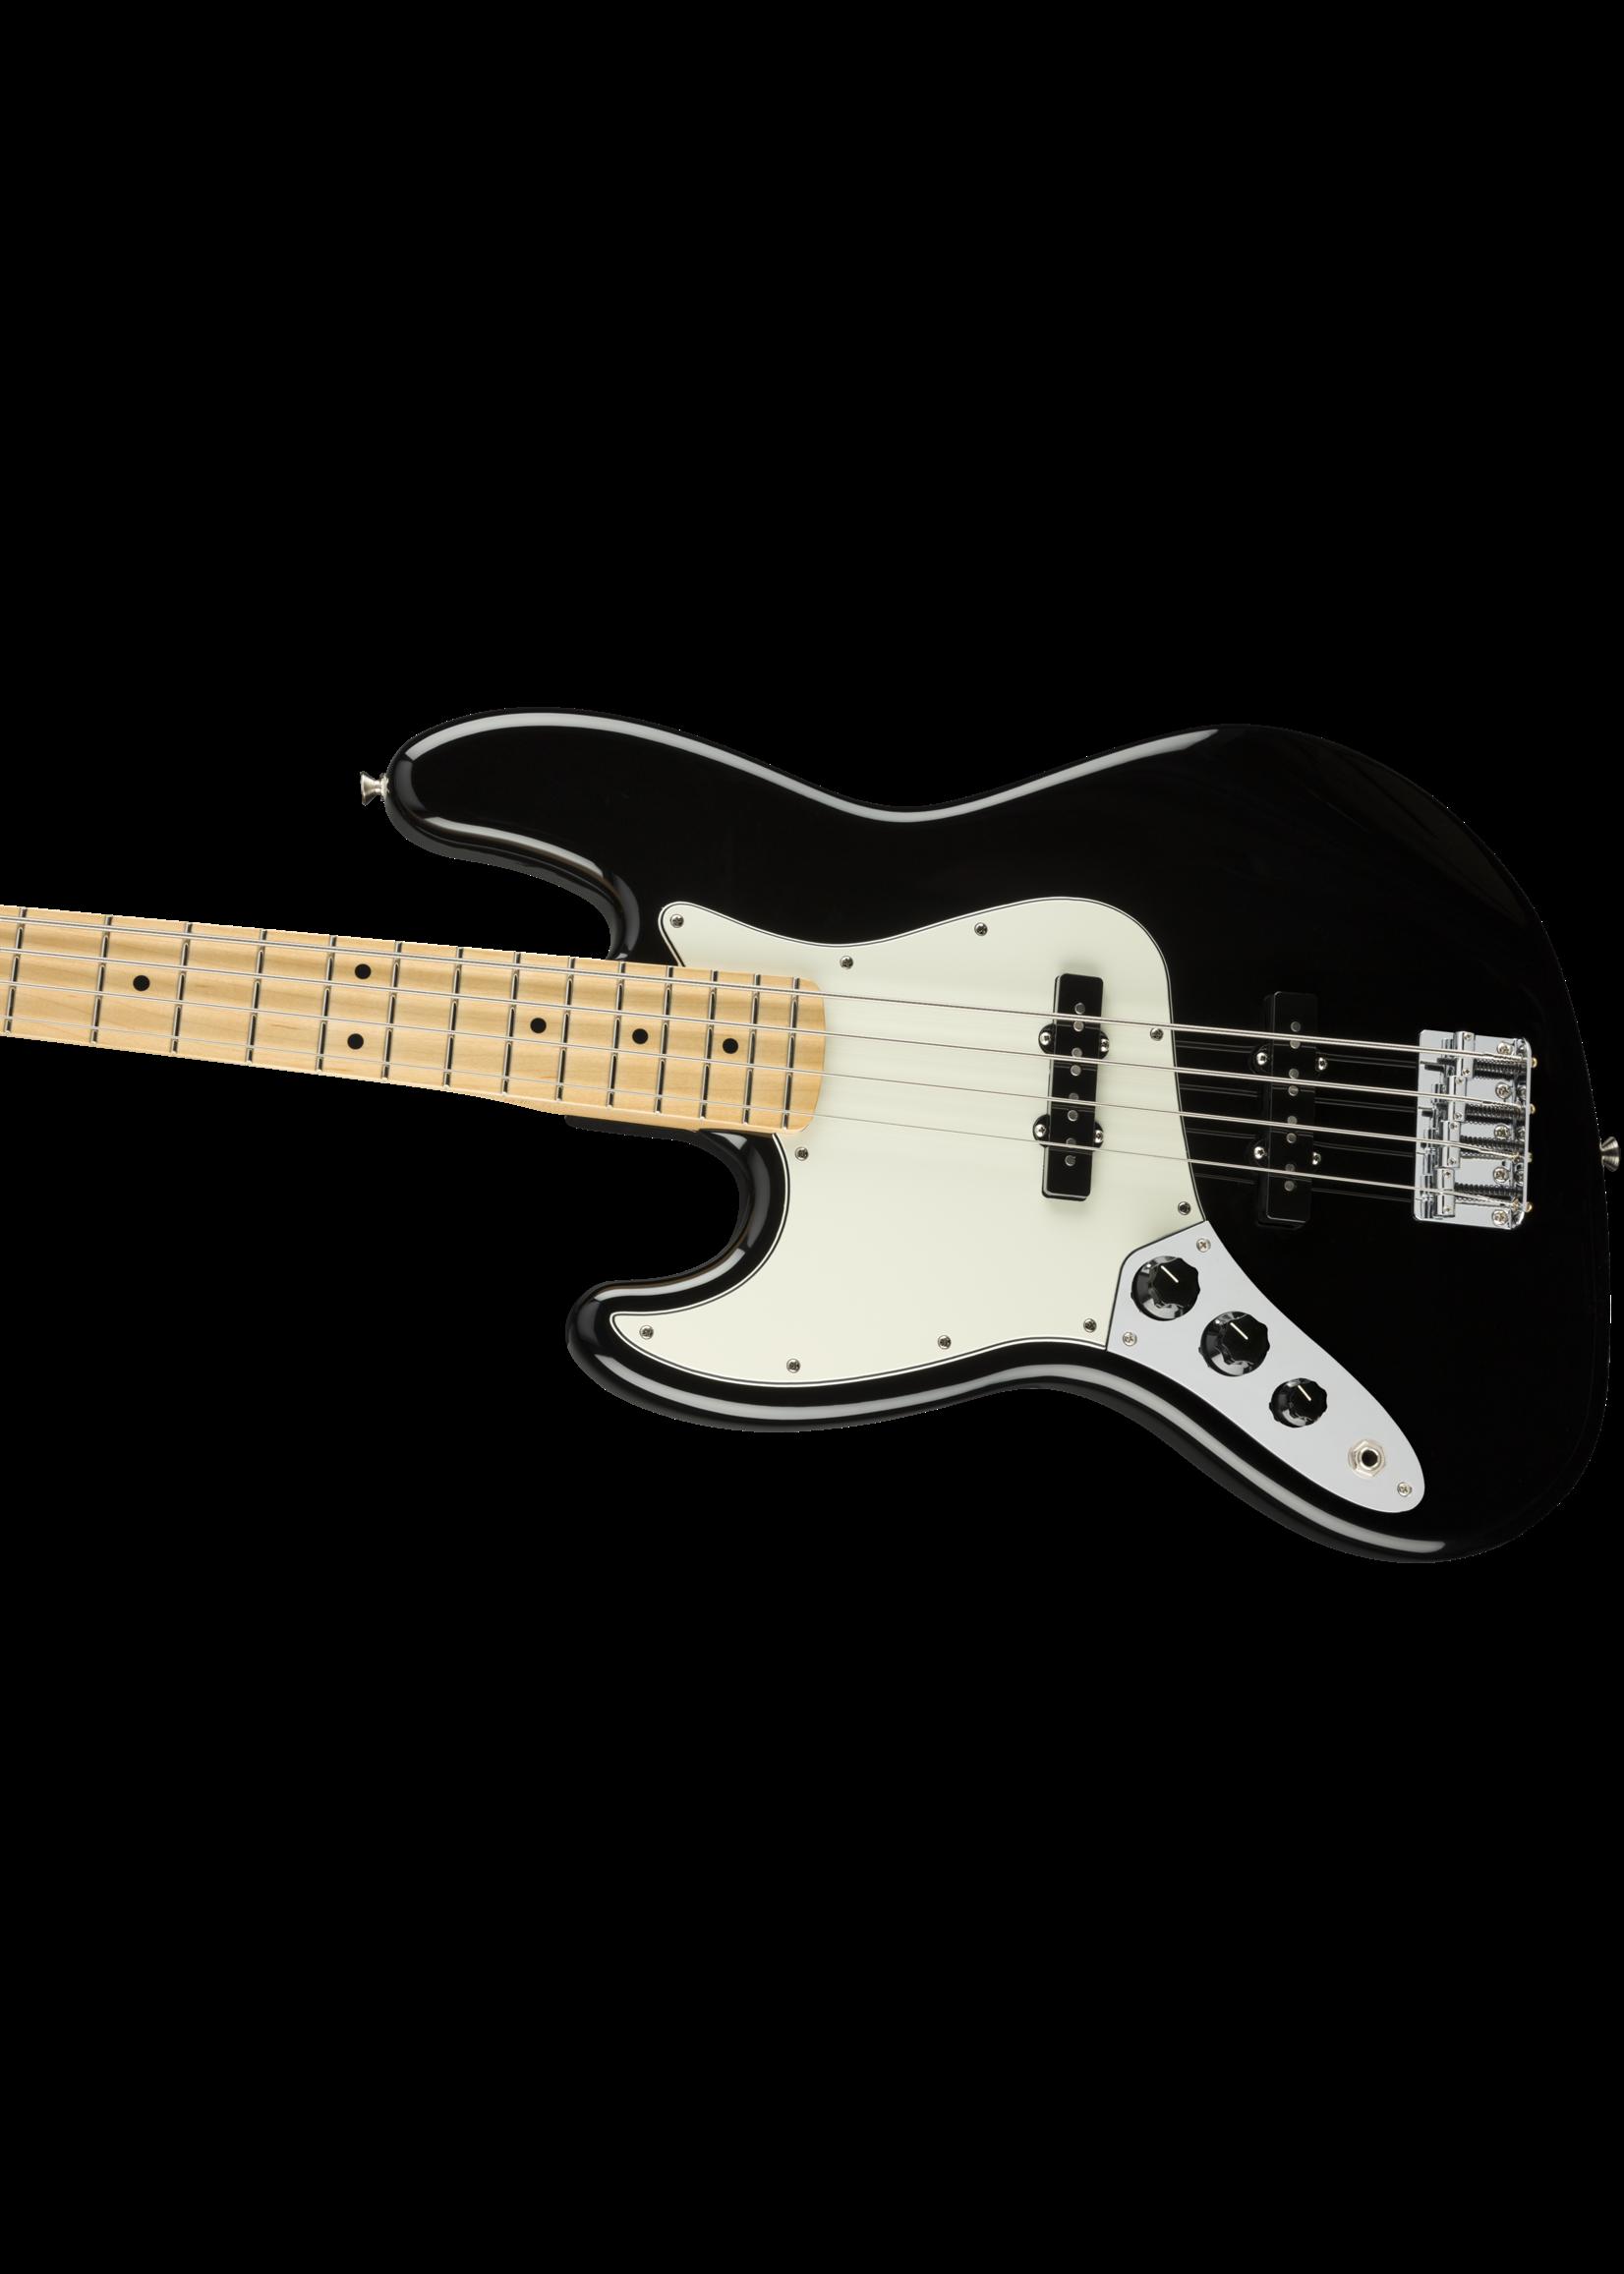 Fender Fender Player Jazz Bass Left-Handed with Maple Fretboard Black